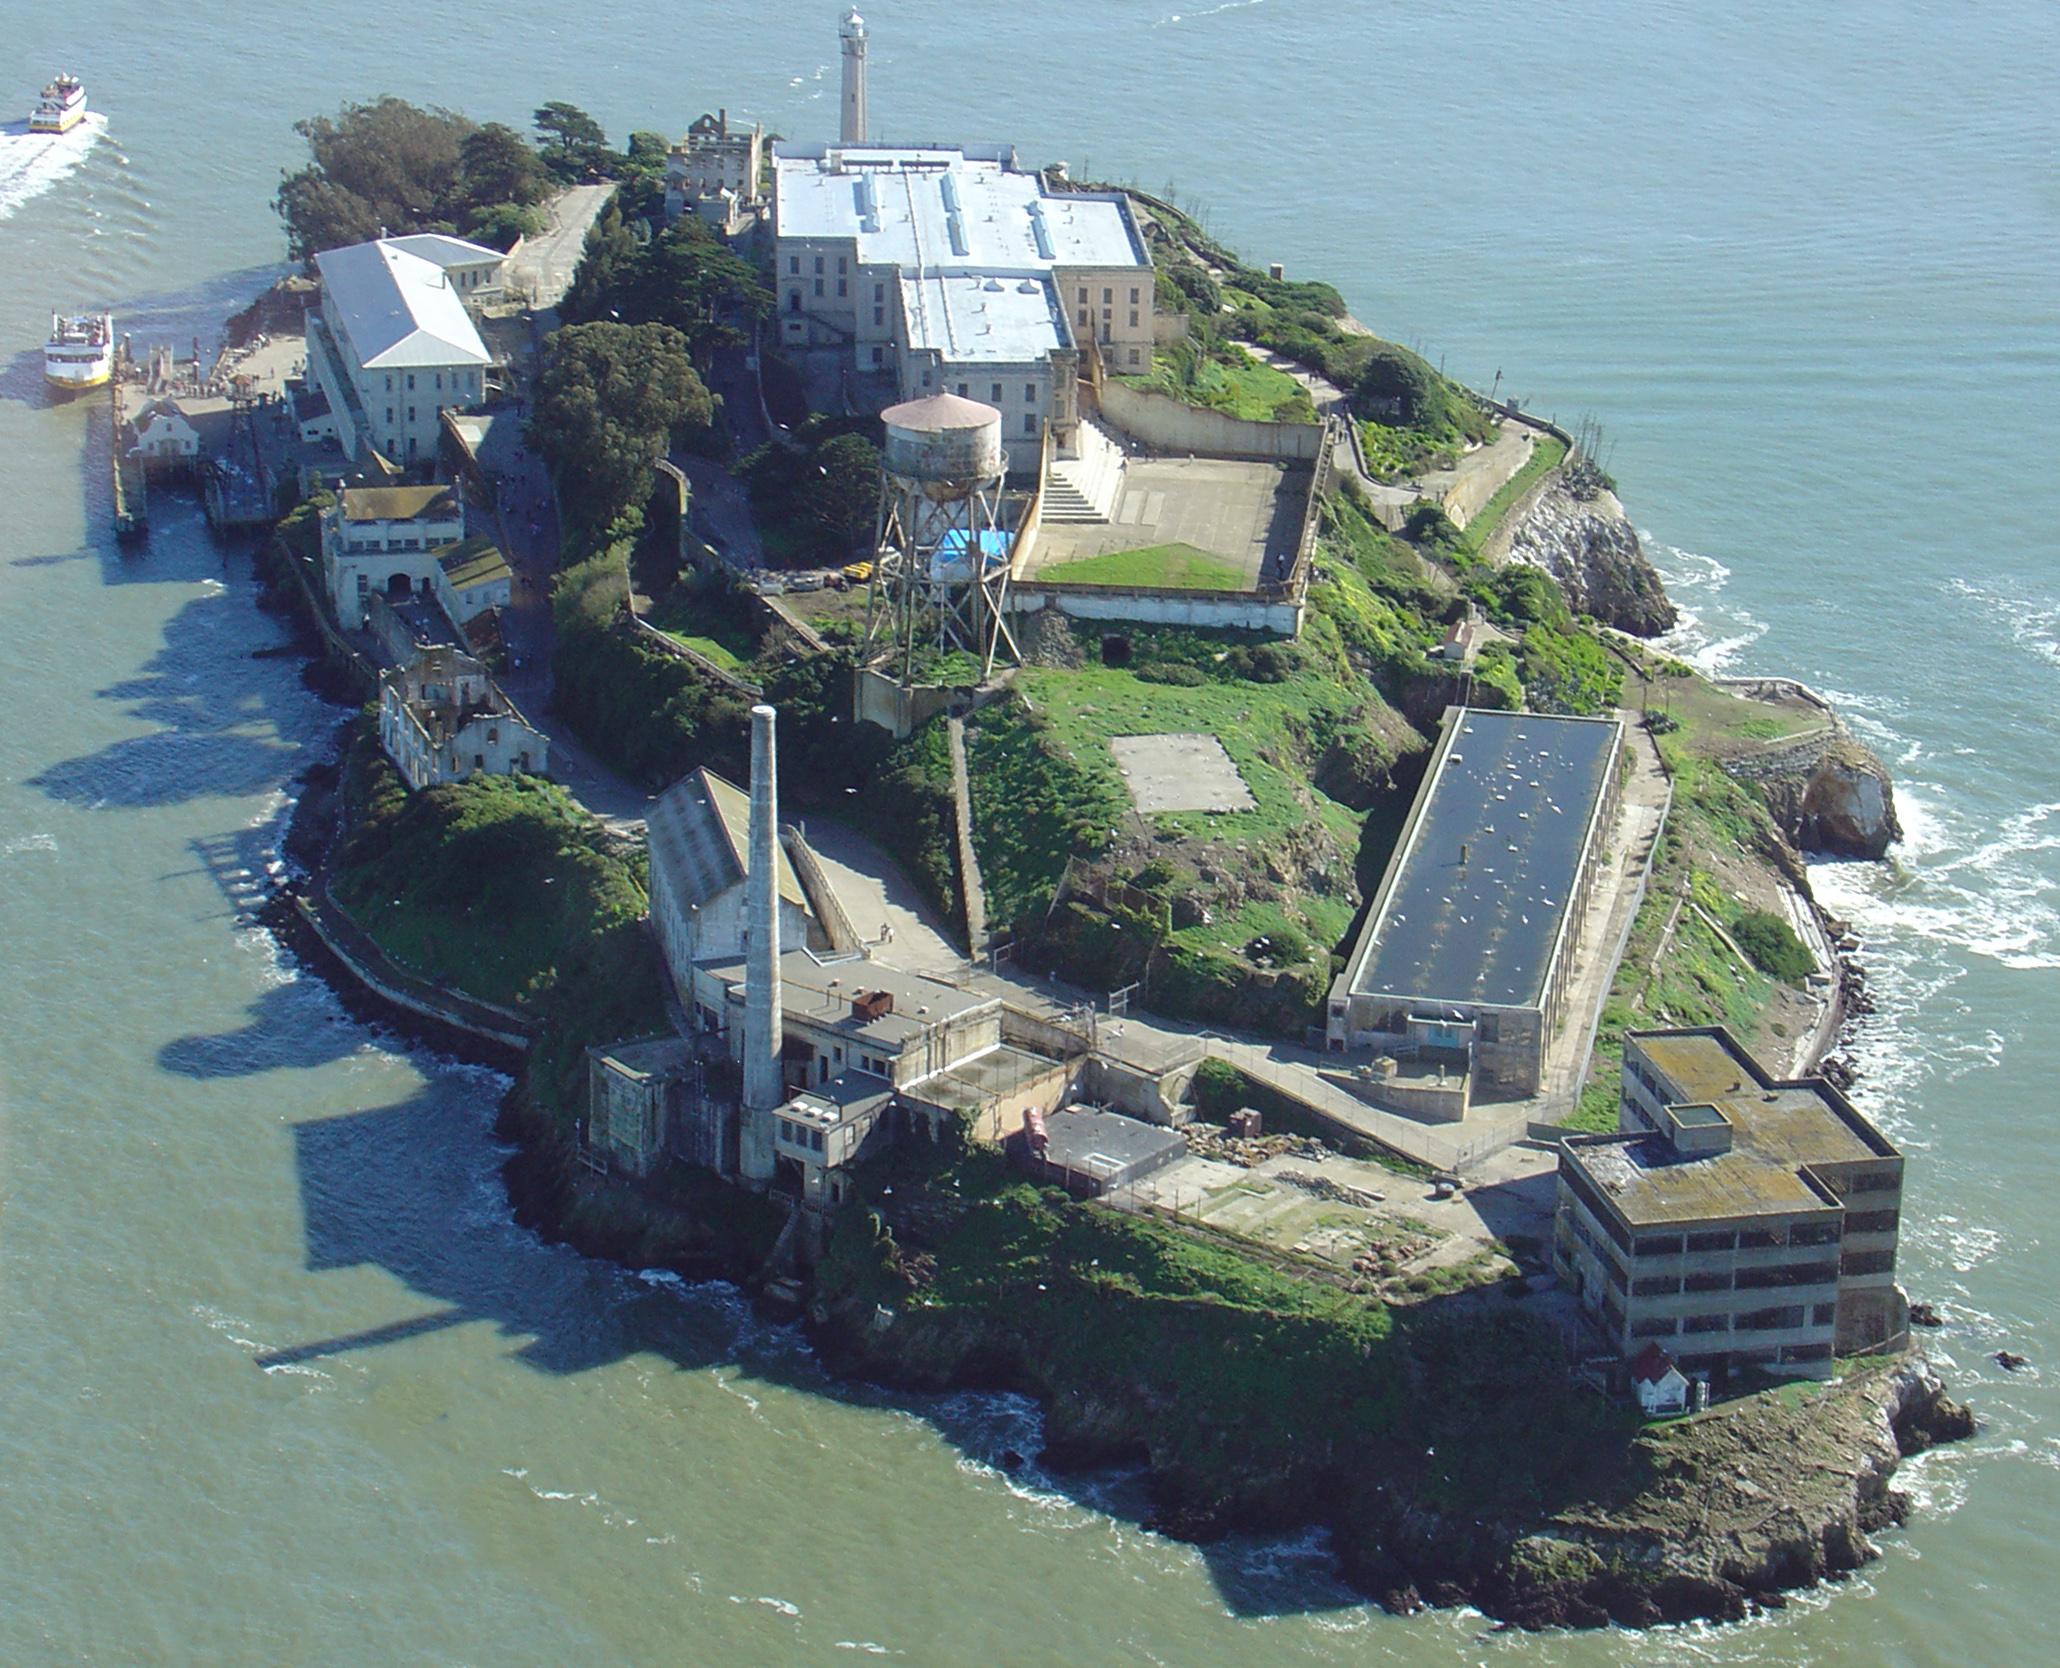 https://upload.wikimedia.org/wikipedia/commons/6/67/Alcatraz_Island,_helicopter_view.jpg